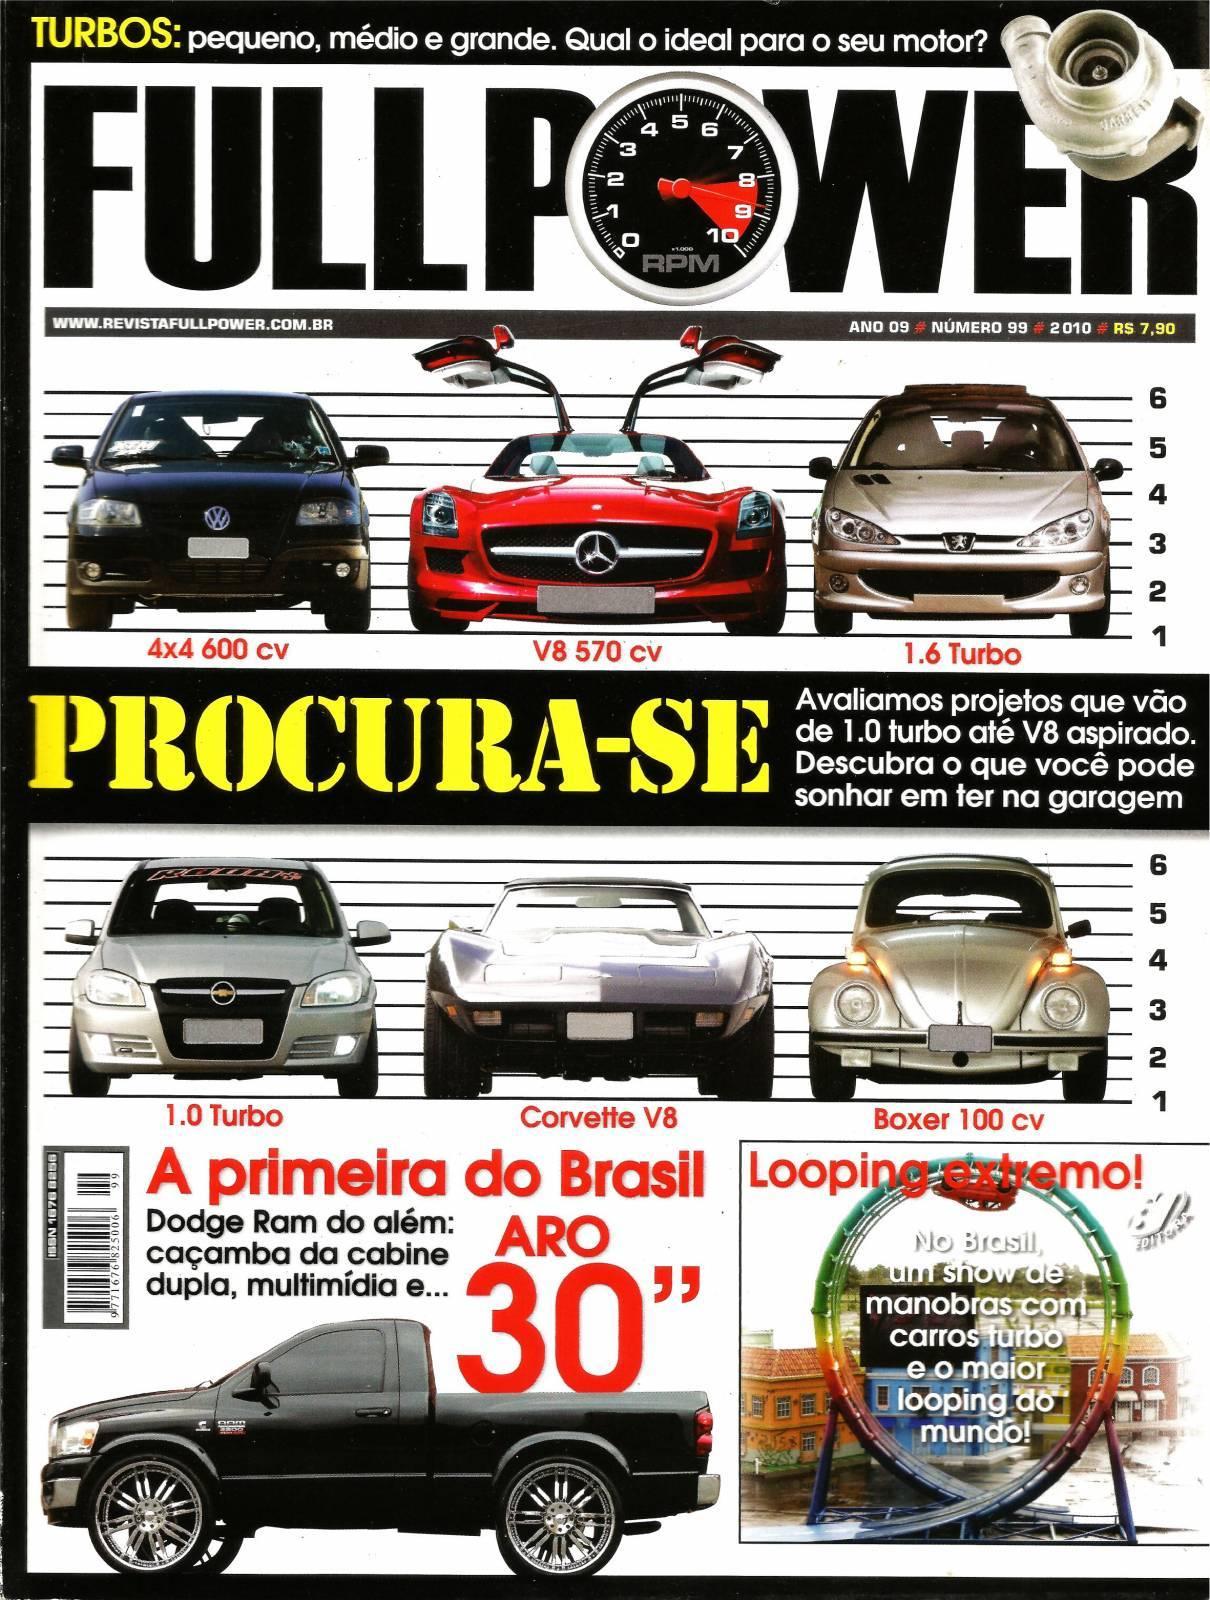 REVISTA FULLPOWER No. 99 ANO 2010 - Loja FullPower